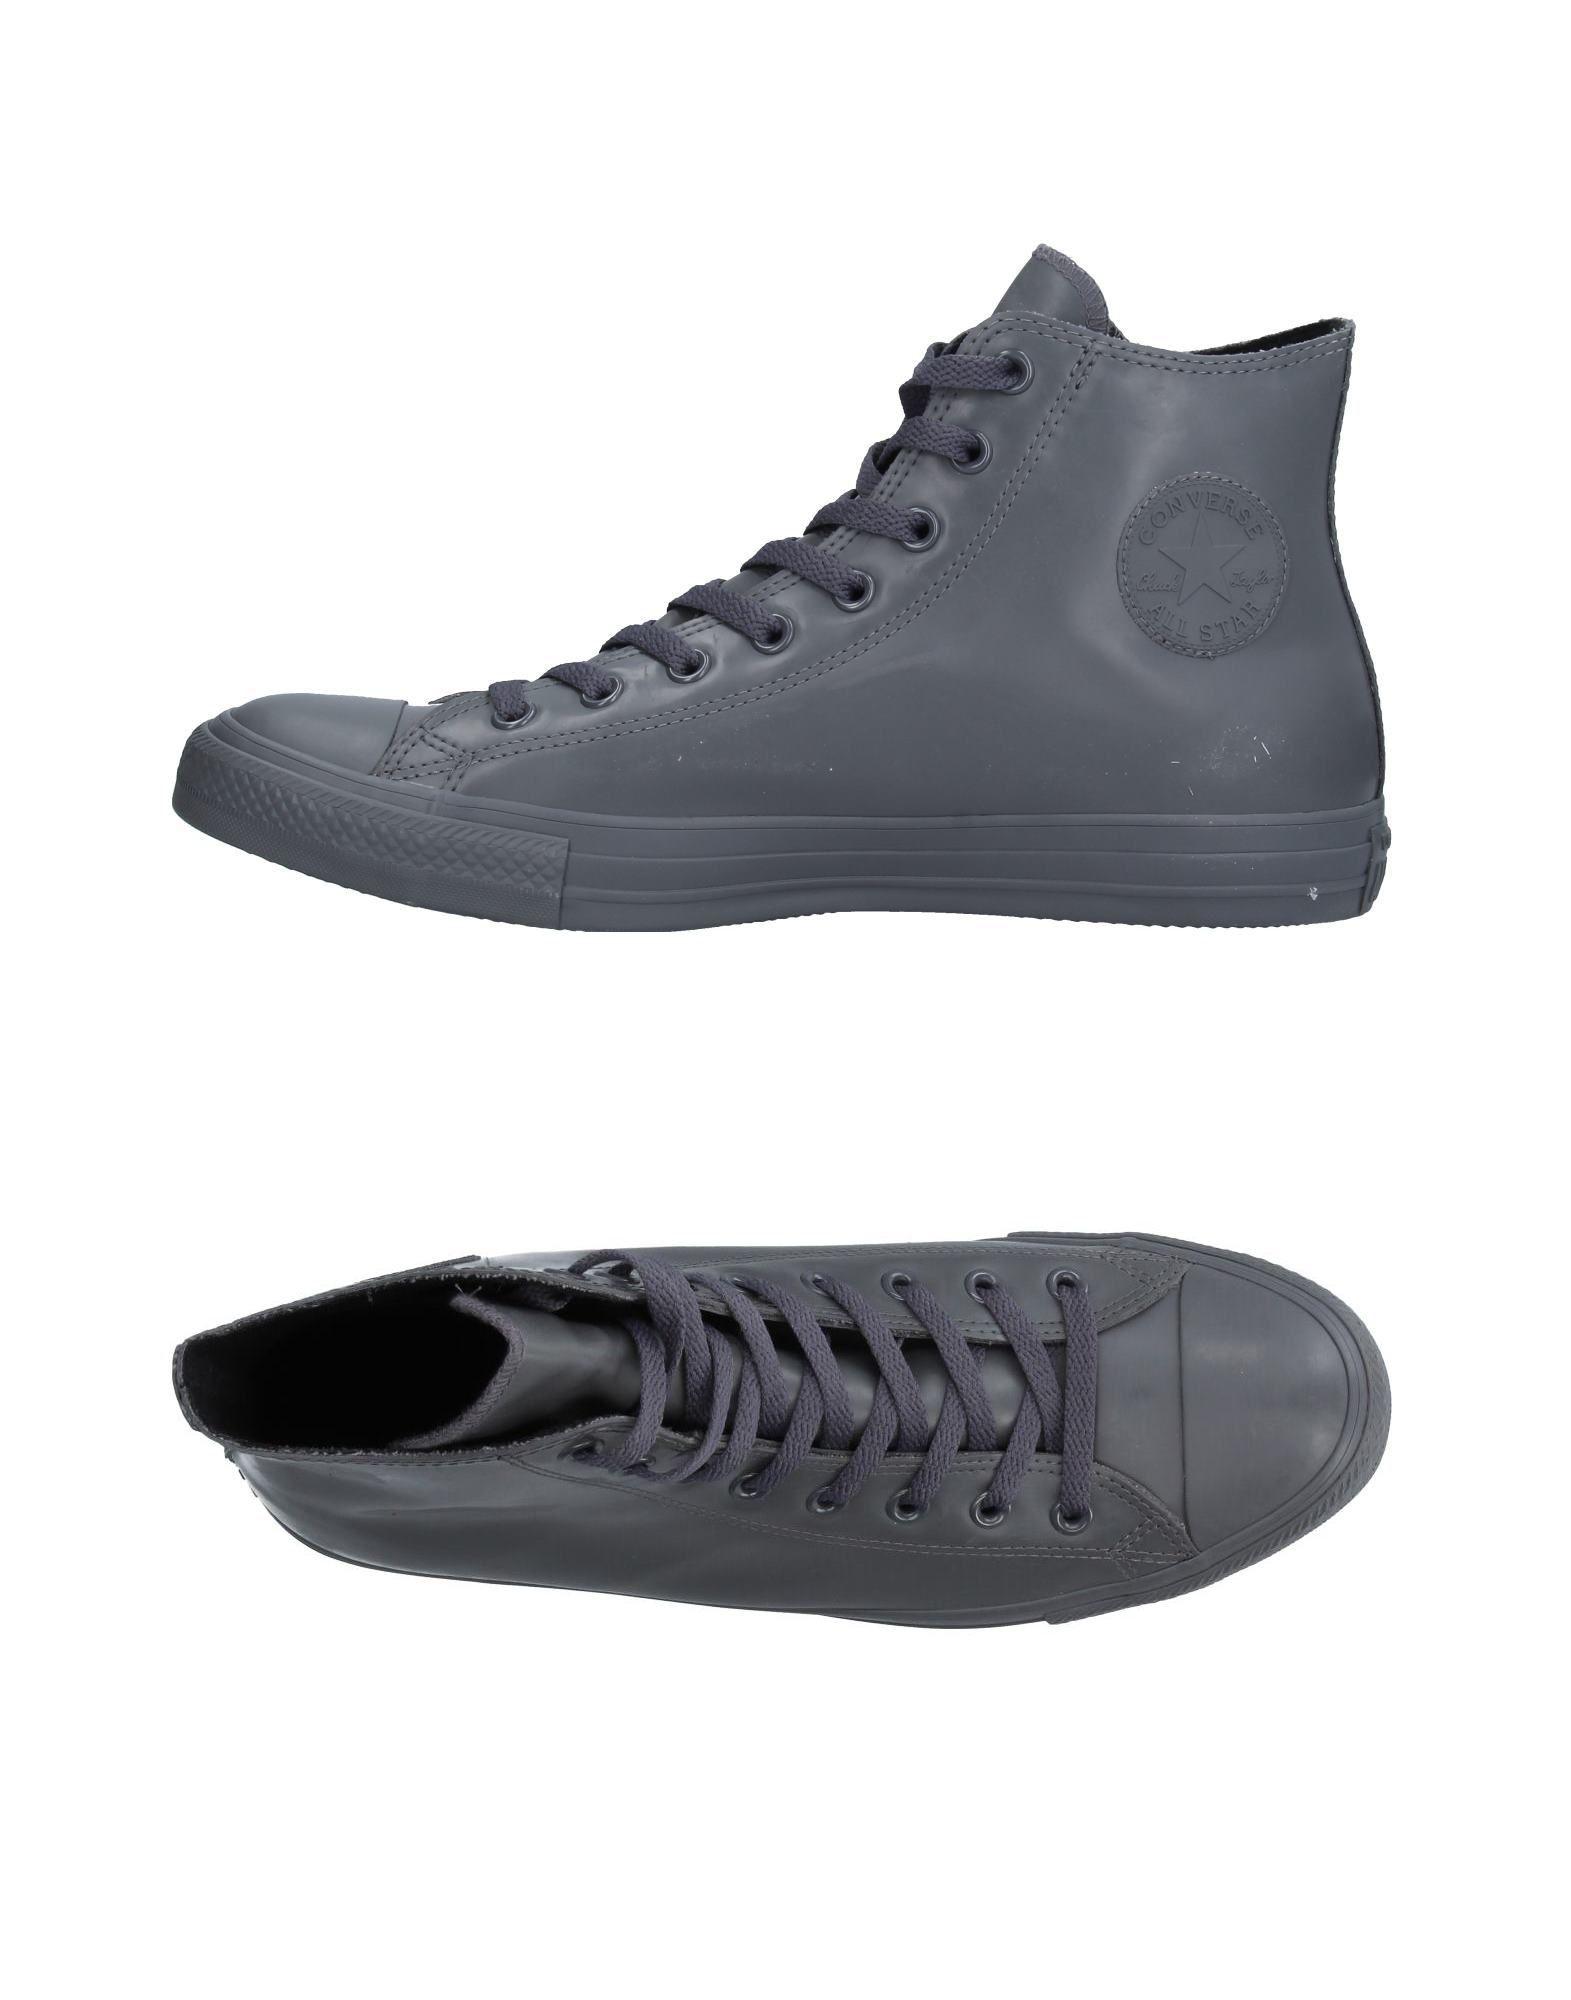 CONVERSE ALL STAR Herren High Sneakers & Tennisschuhe Farbe Grau Größe 4